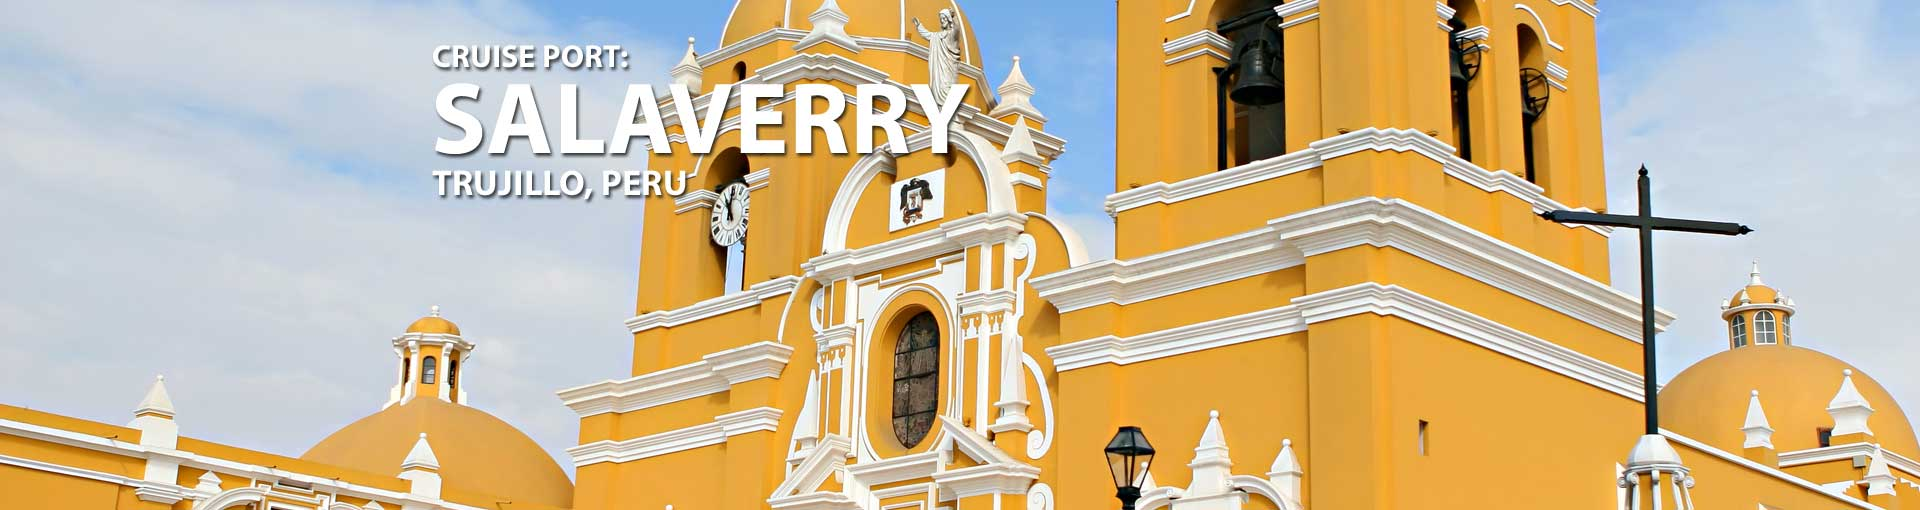 Cruises to Salaverry,Trujillo, Peru